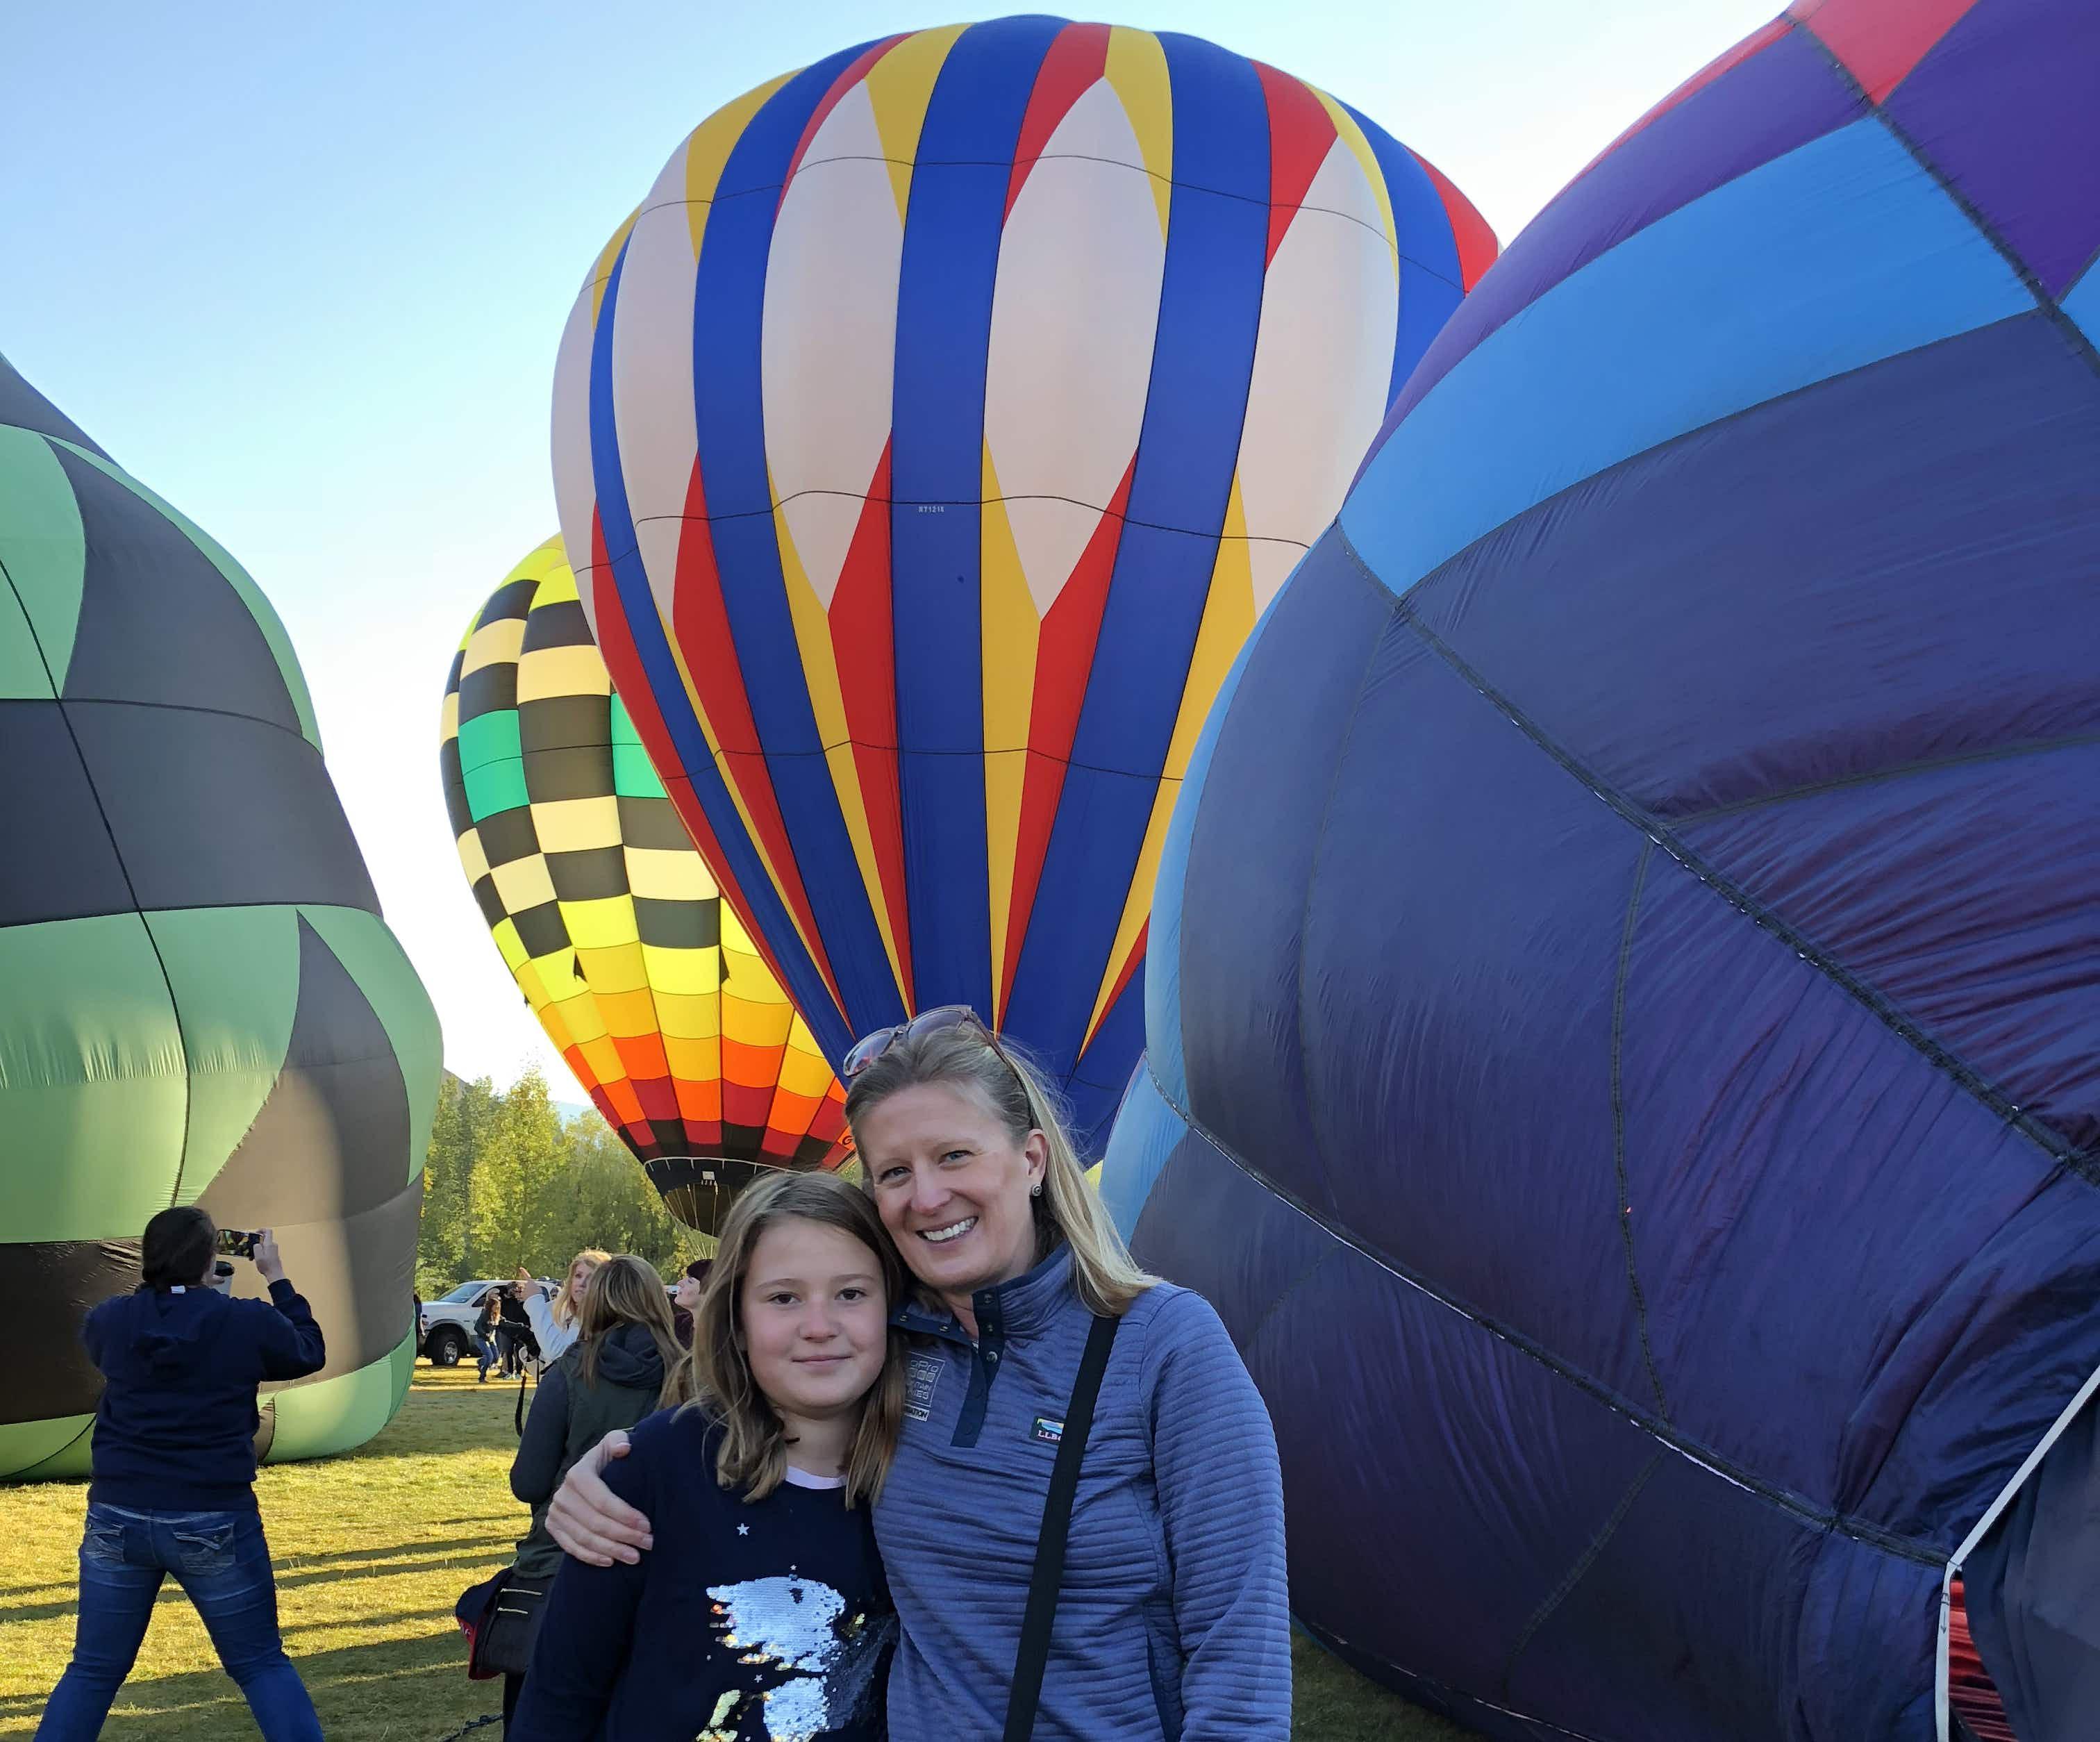 Family travel snap: hot-air ballooning in Snowmass, Colorado